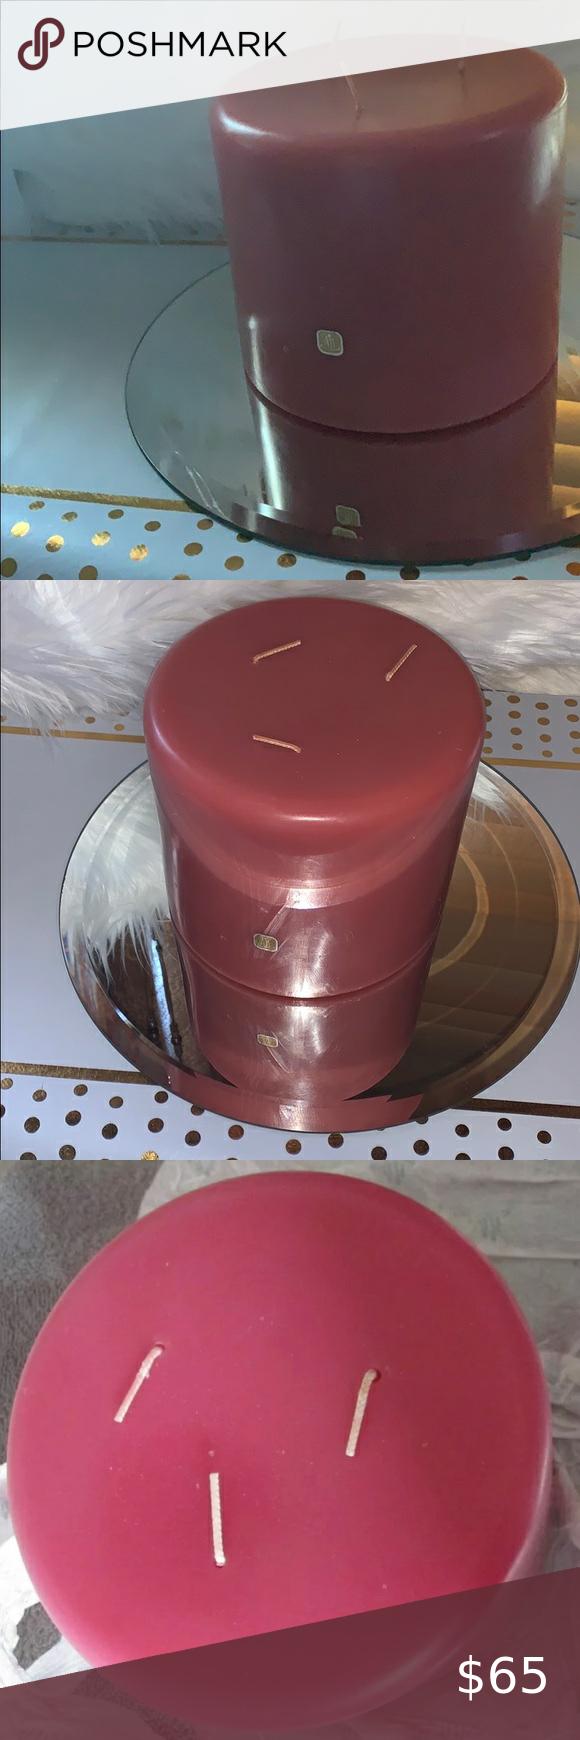 Red Tea Sweet Flag 3 Wick Partylite Pillar Candle In 2020 Pillar Candles Red Tea Sweet